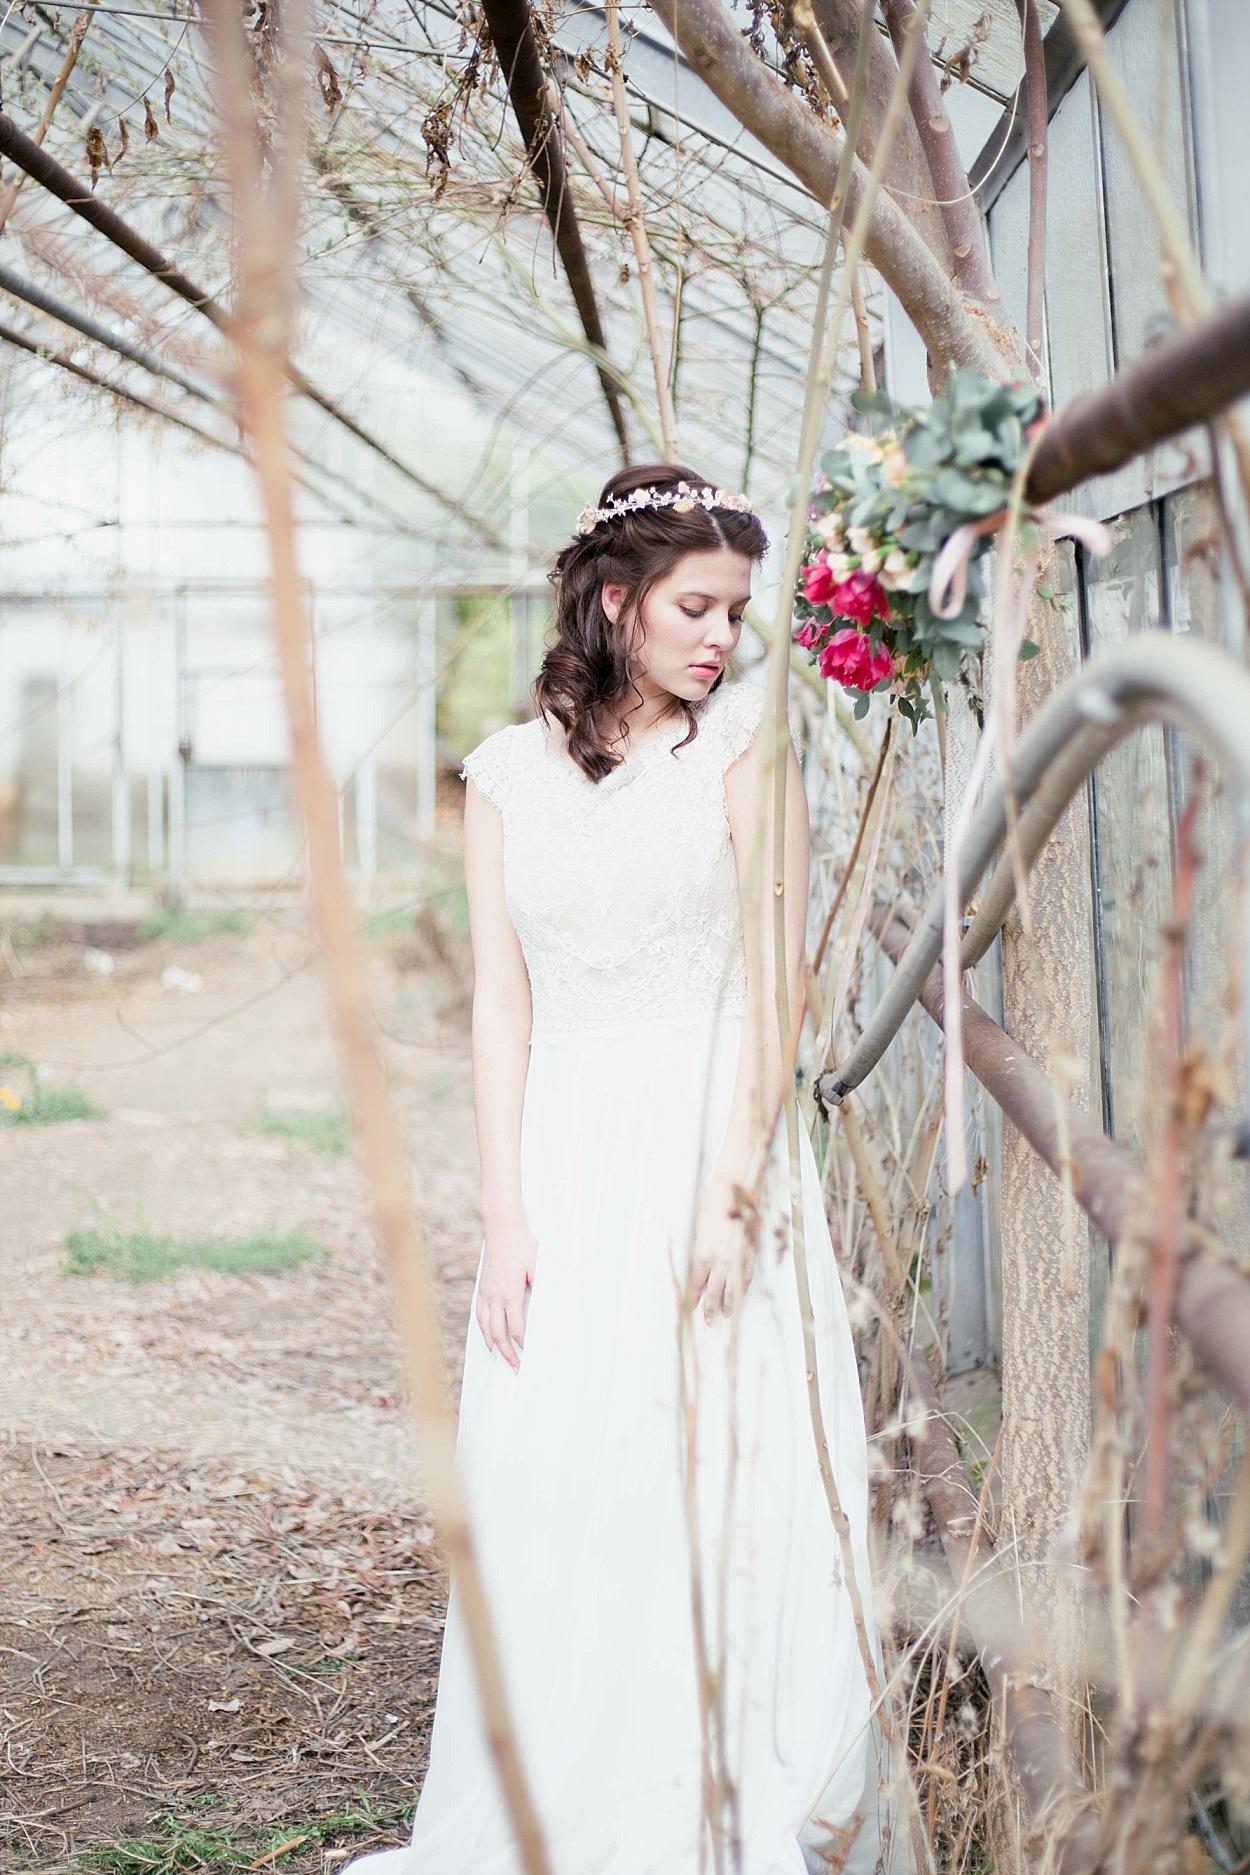 Brautkleid Spitze elegant